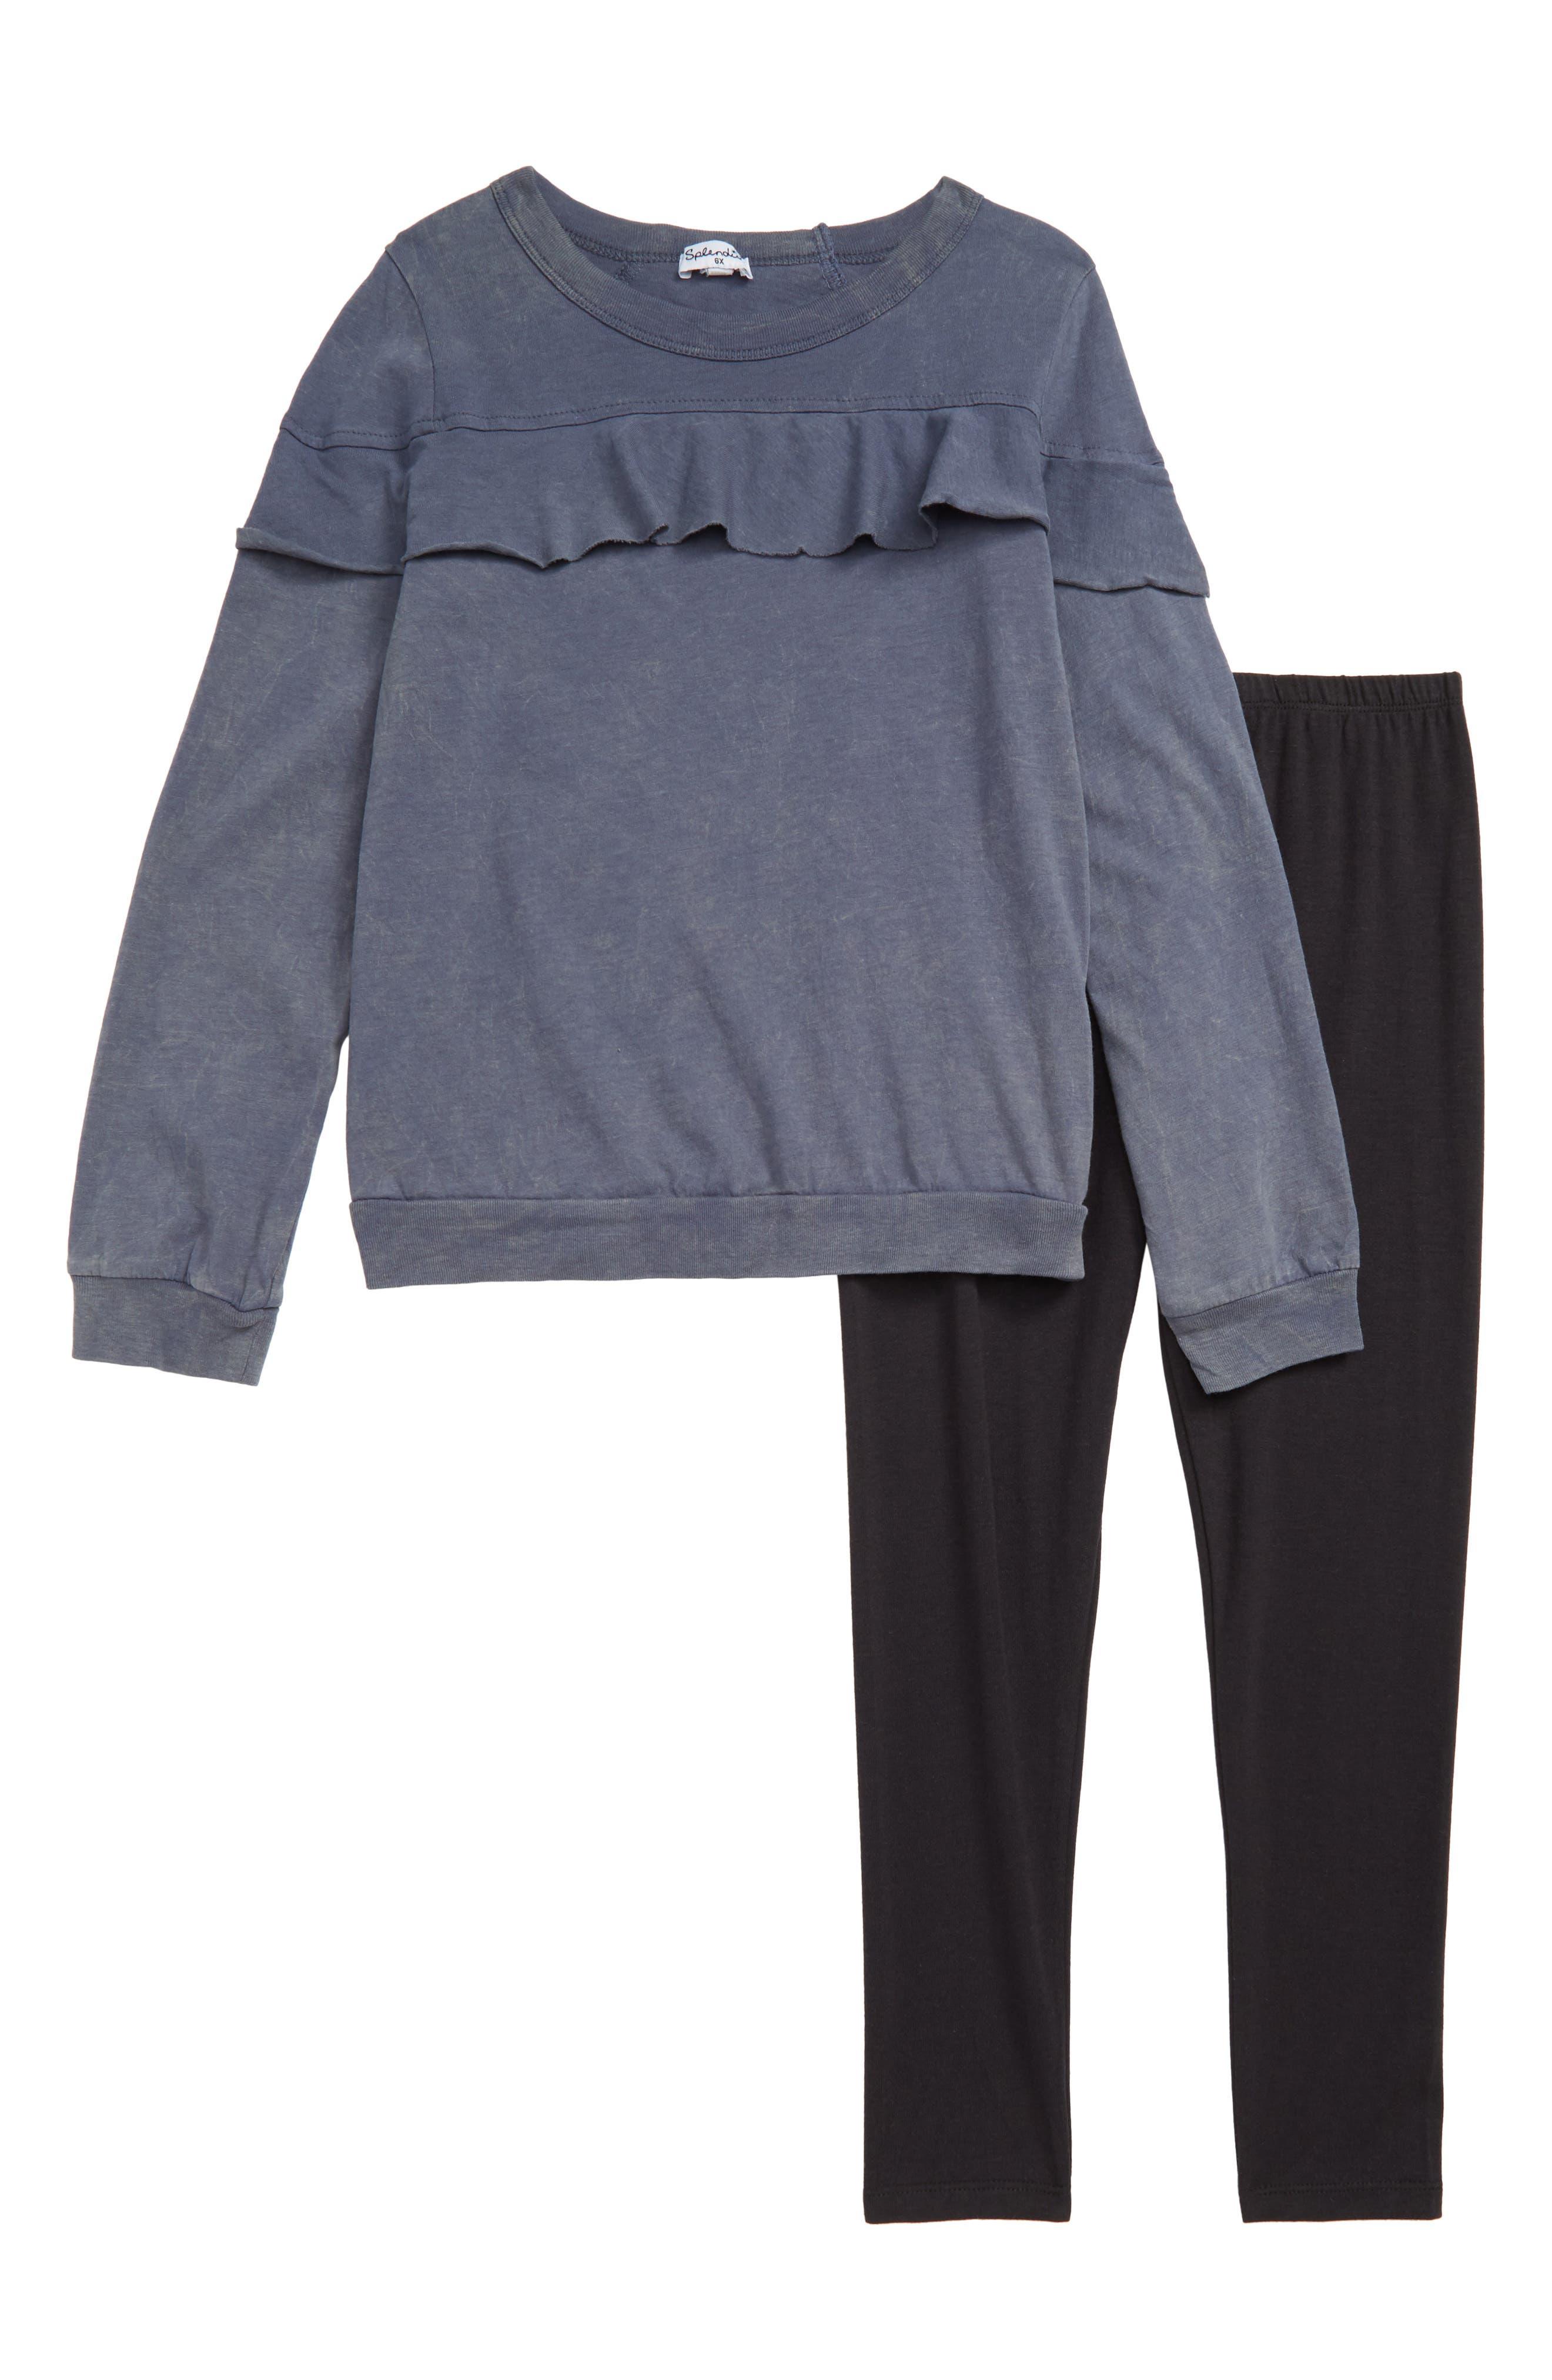 Girls Splendid Sweatshirt  Leggings Set